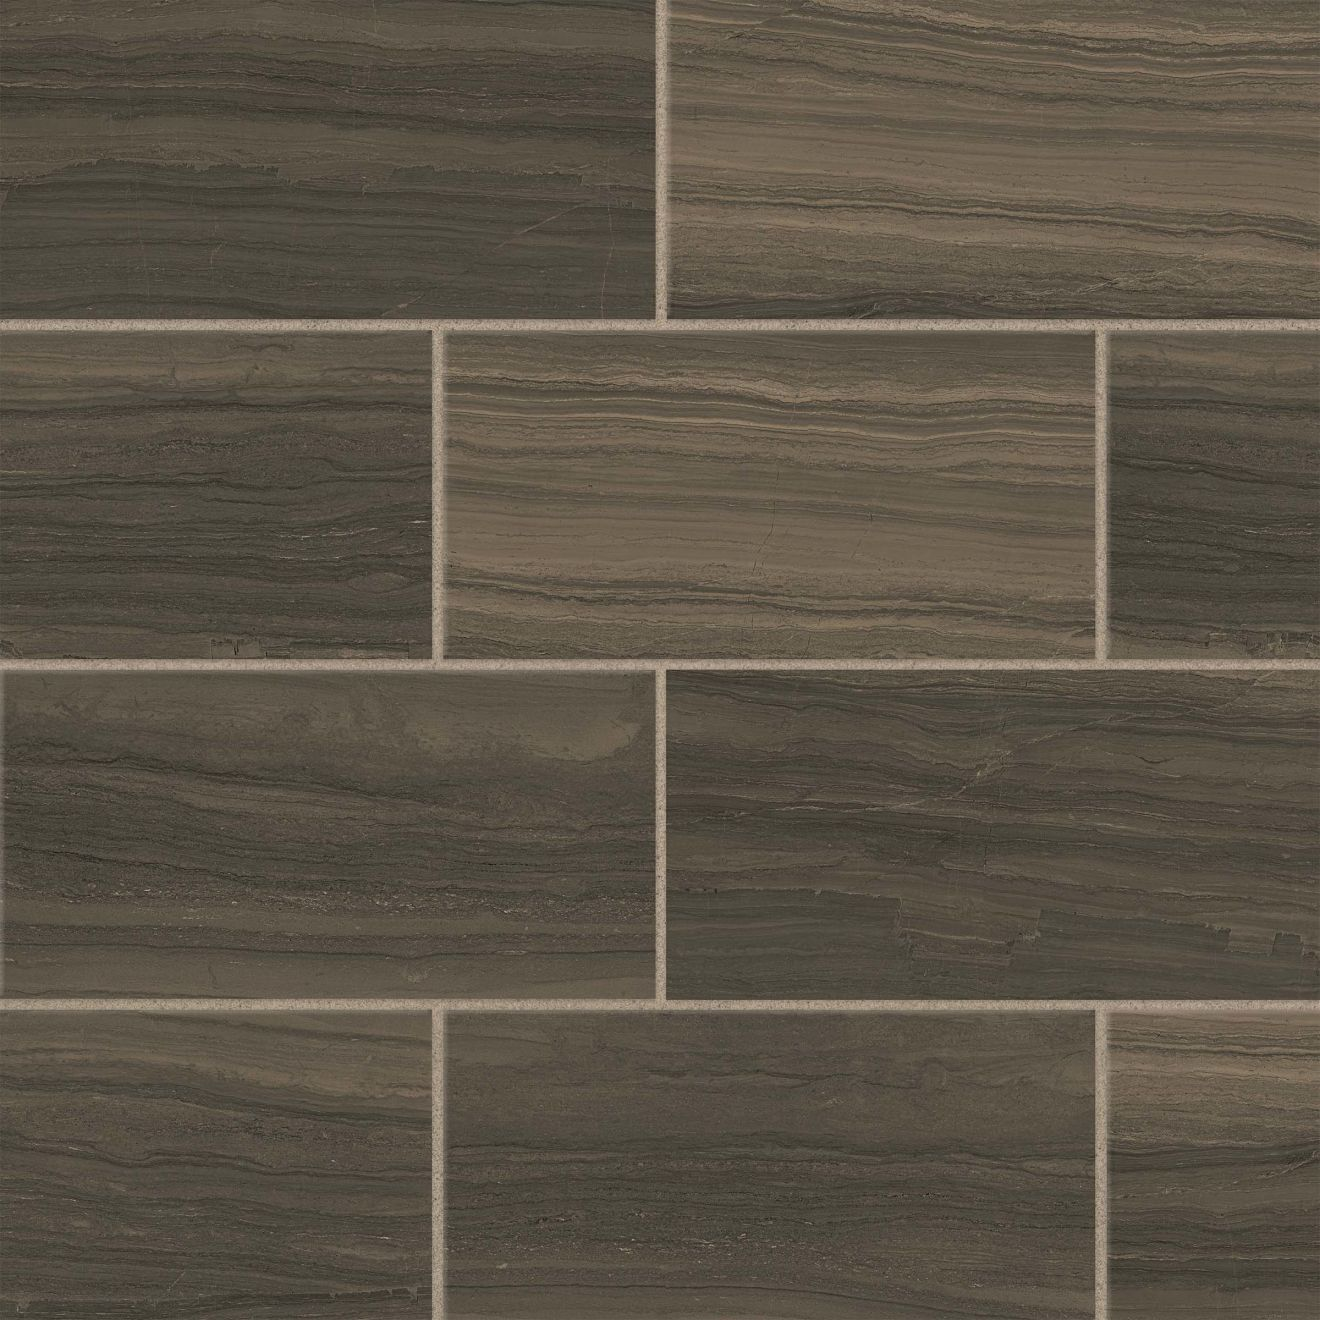 "Highland 12"" x 24"" Floor & Wall Tile in Cocoa"